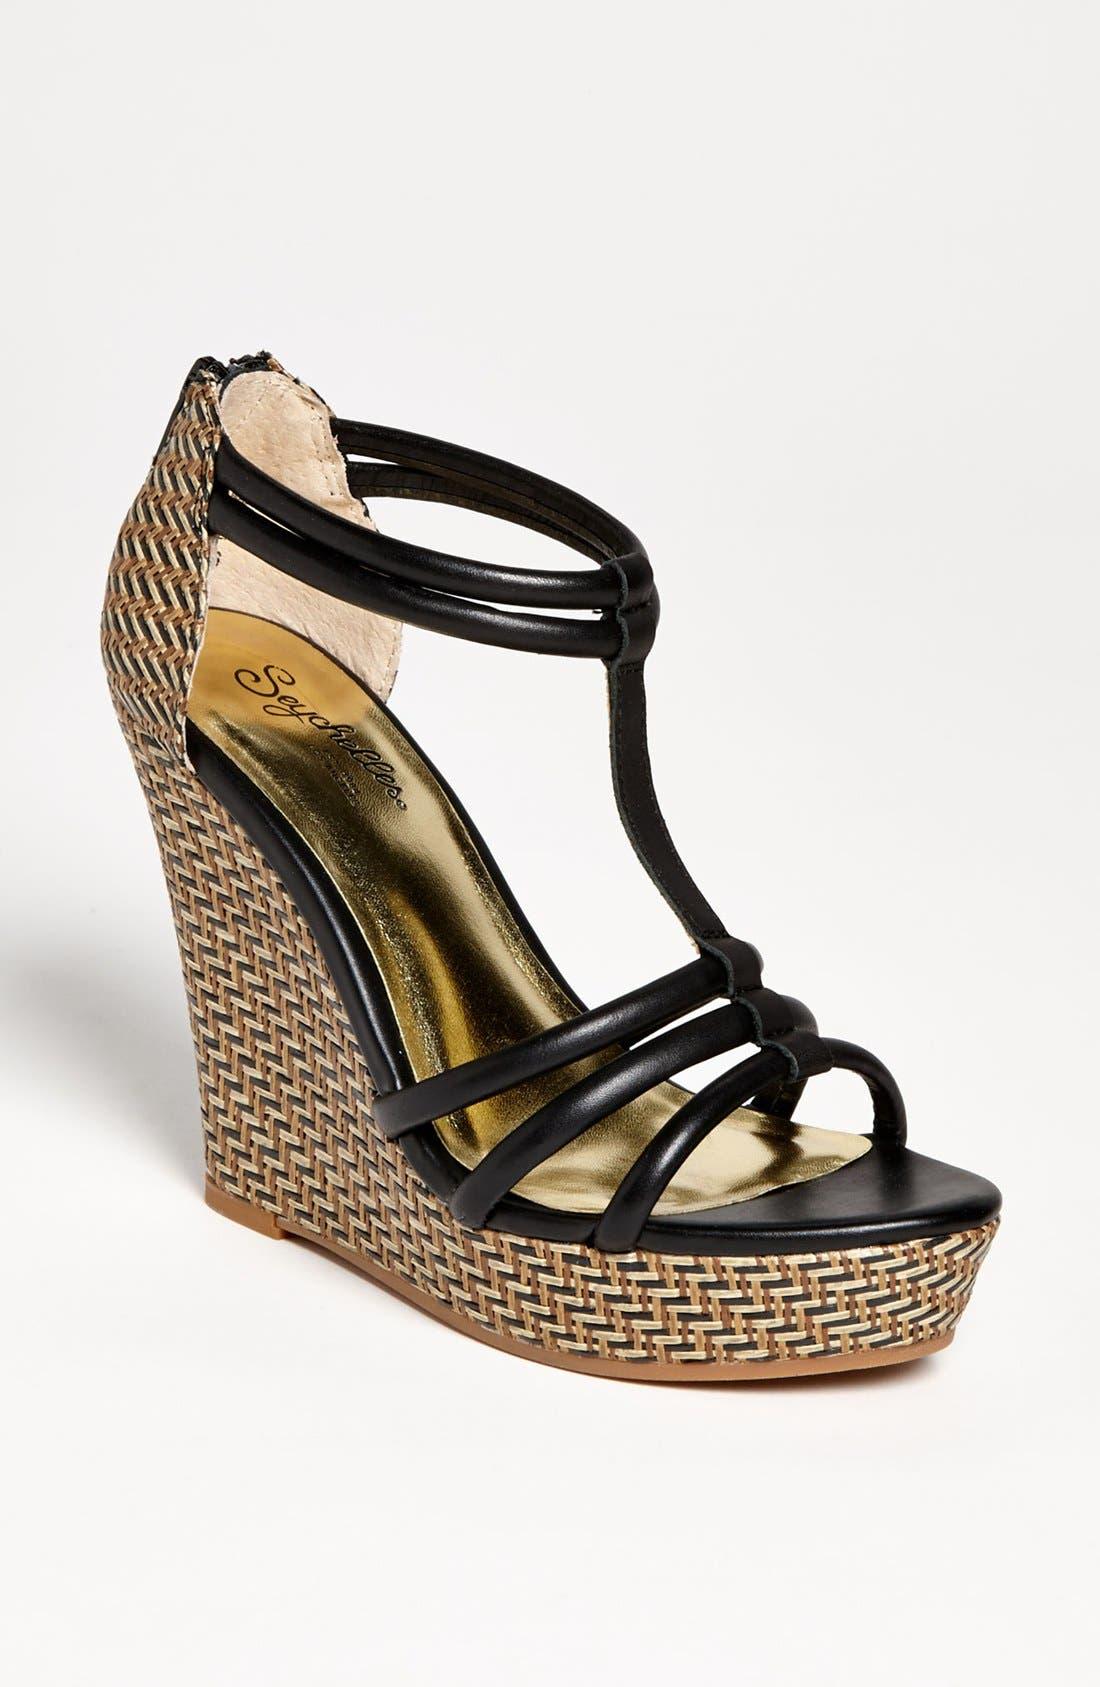 Alternate Image 1 Selected - Seychelles 'Gasp' Sandal